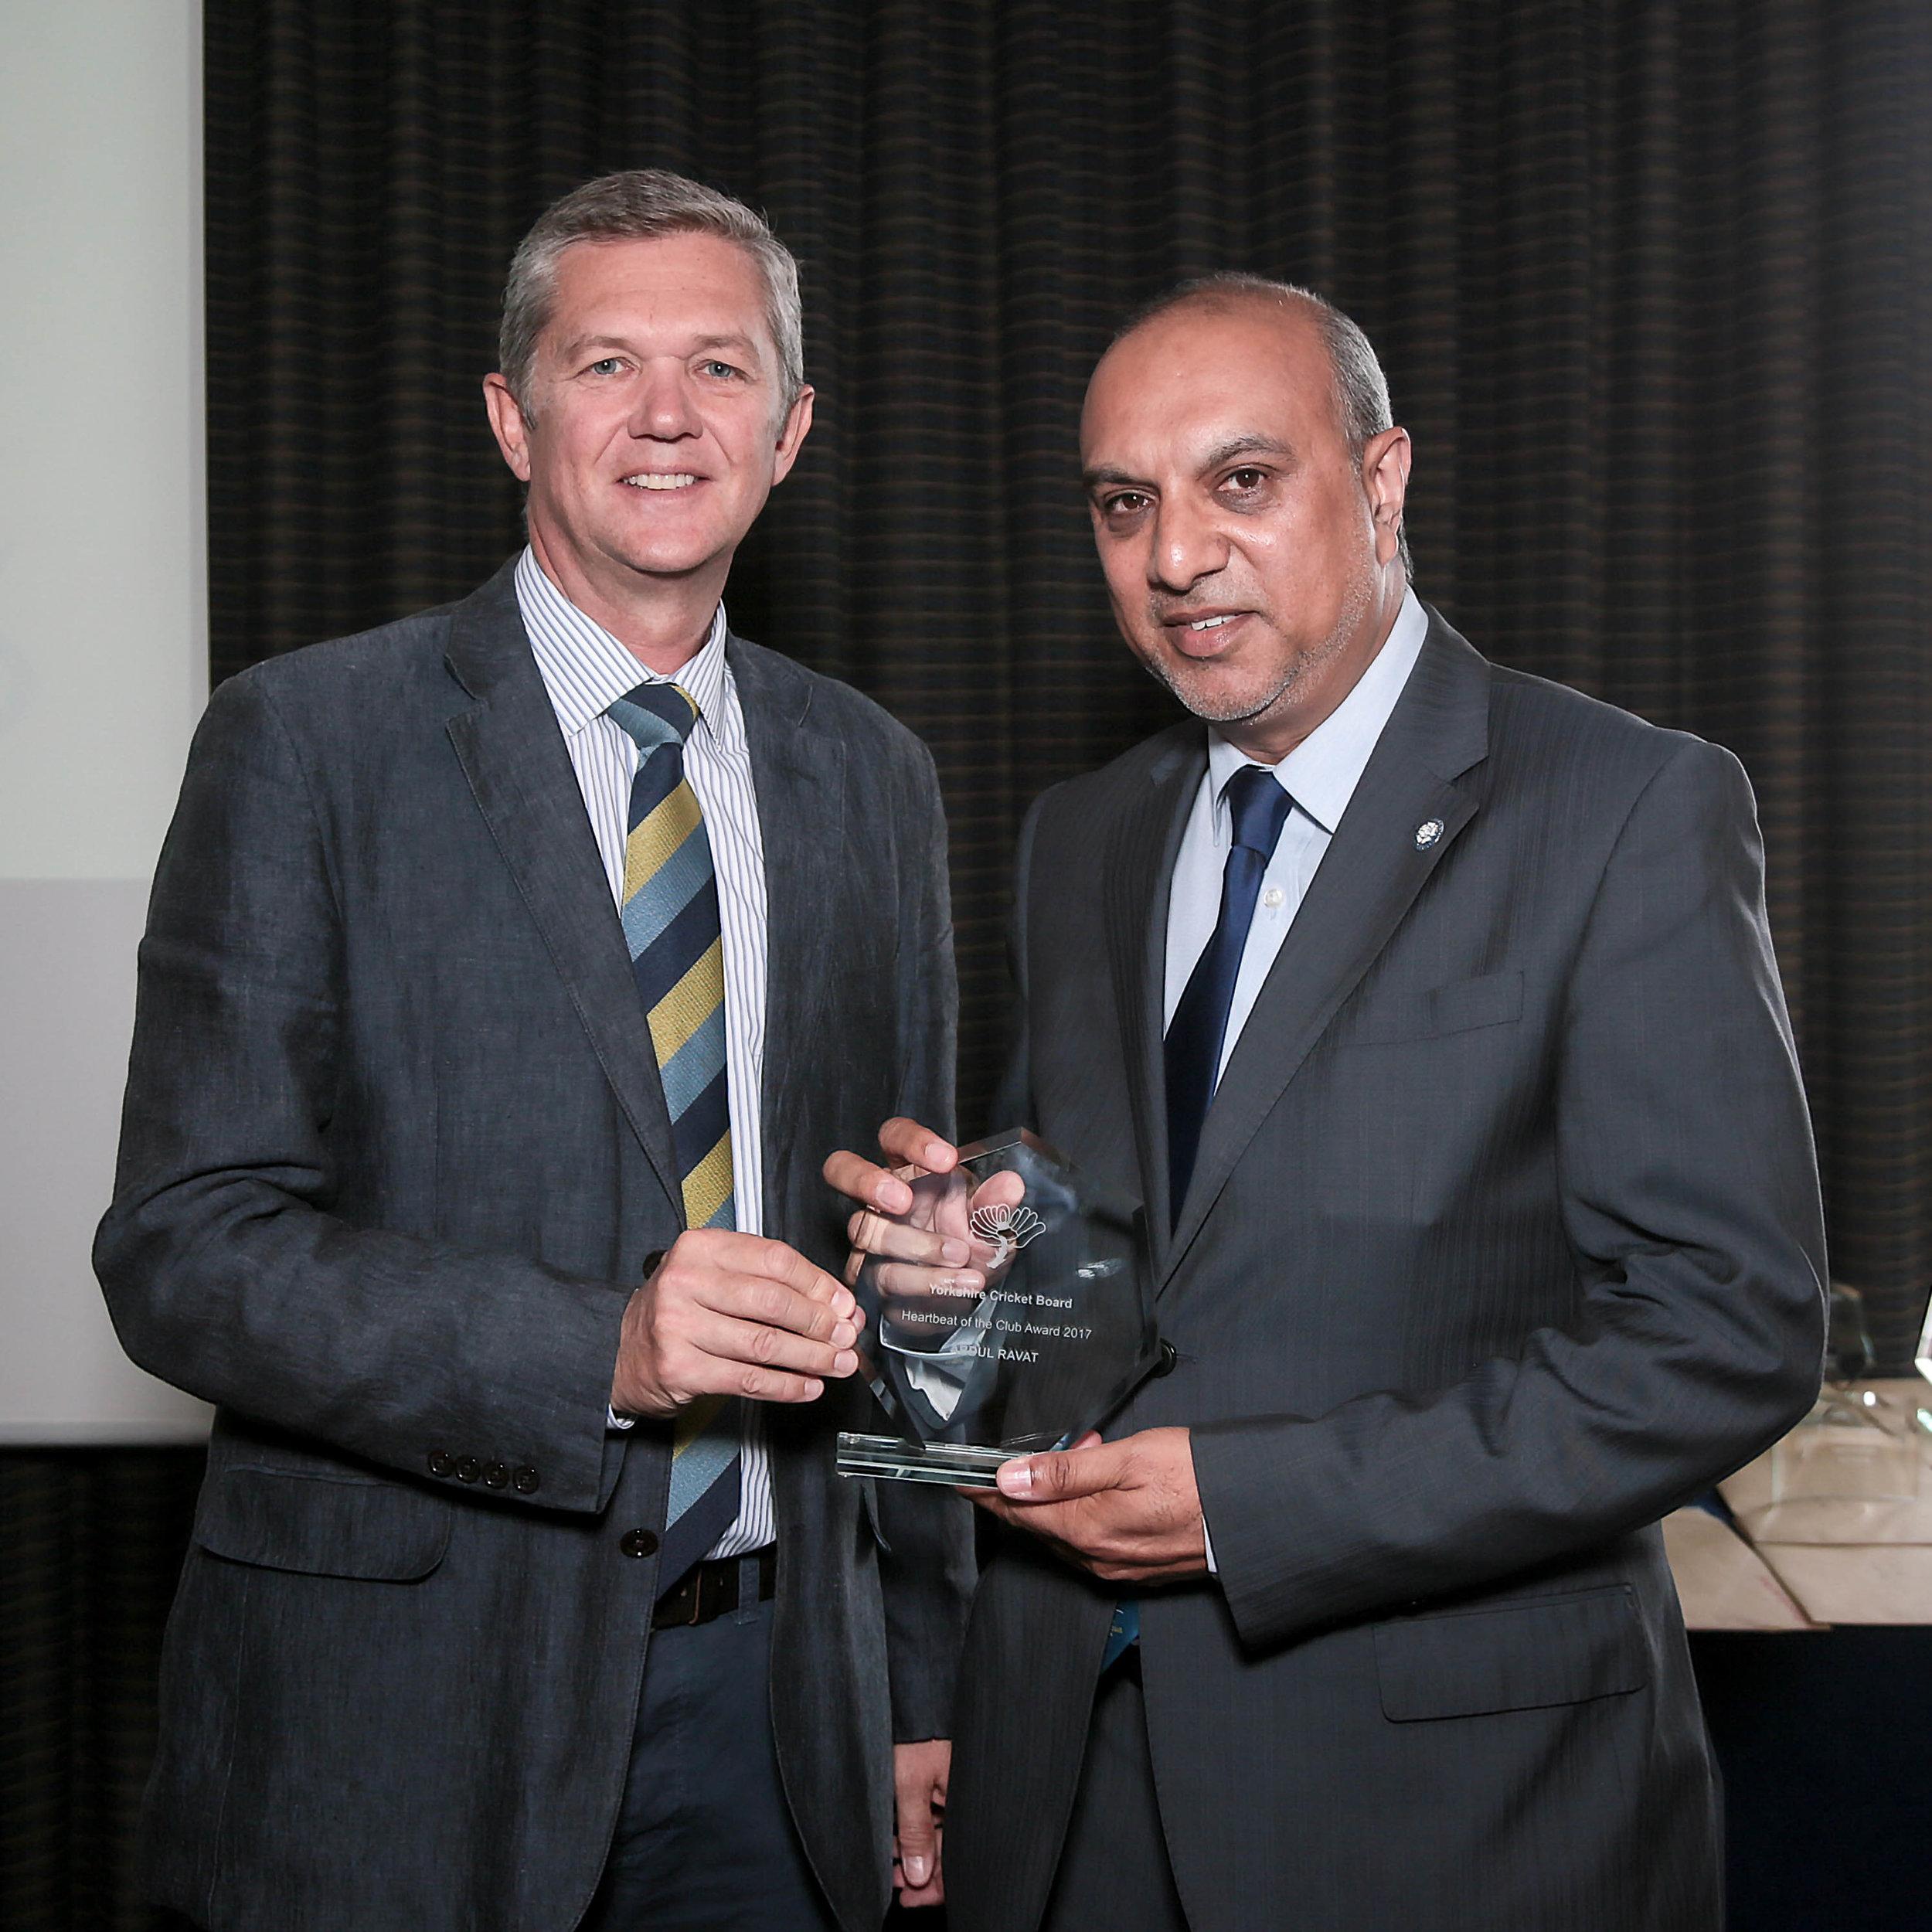 Yorkshire County Cricket Club chief executive Mark Arthur (left) presents Abdul Ravat with his Yorkshire OSCA